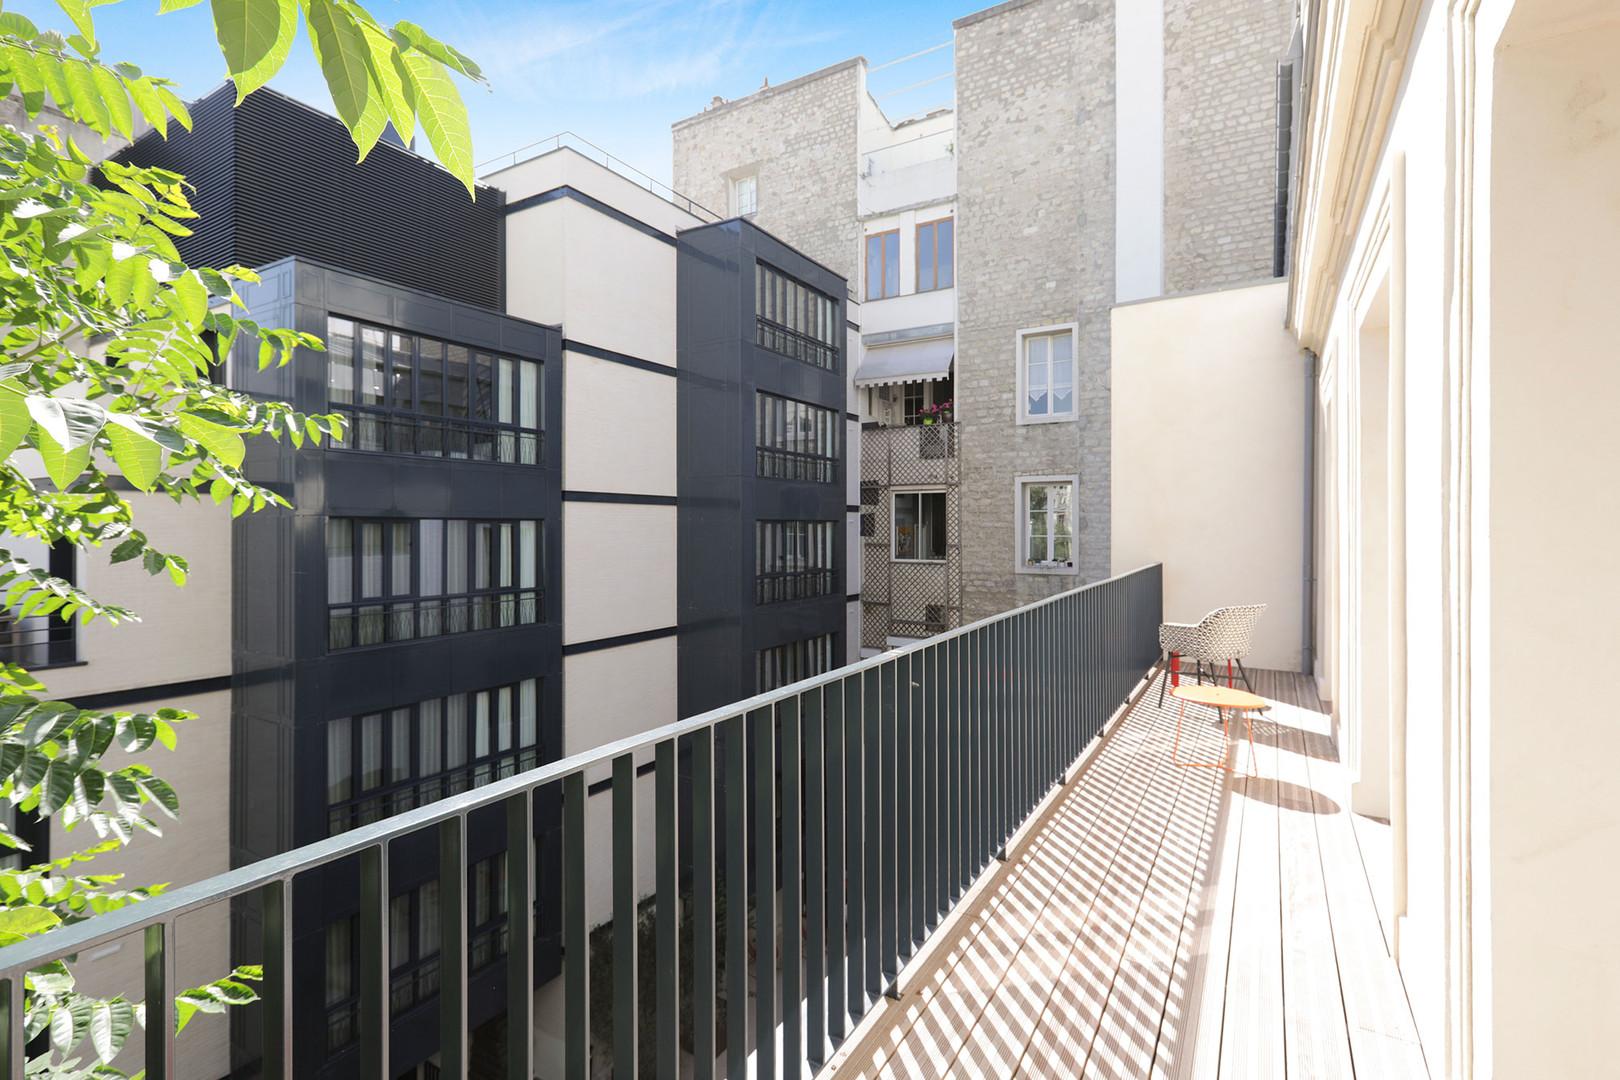 Exterior-Balcony-0C1A8867.jpg